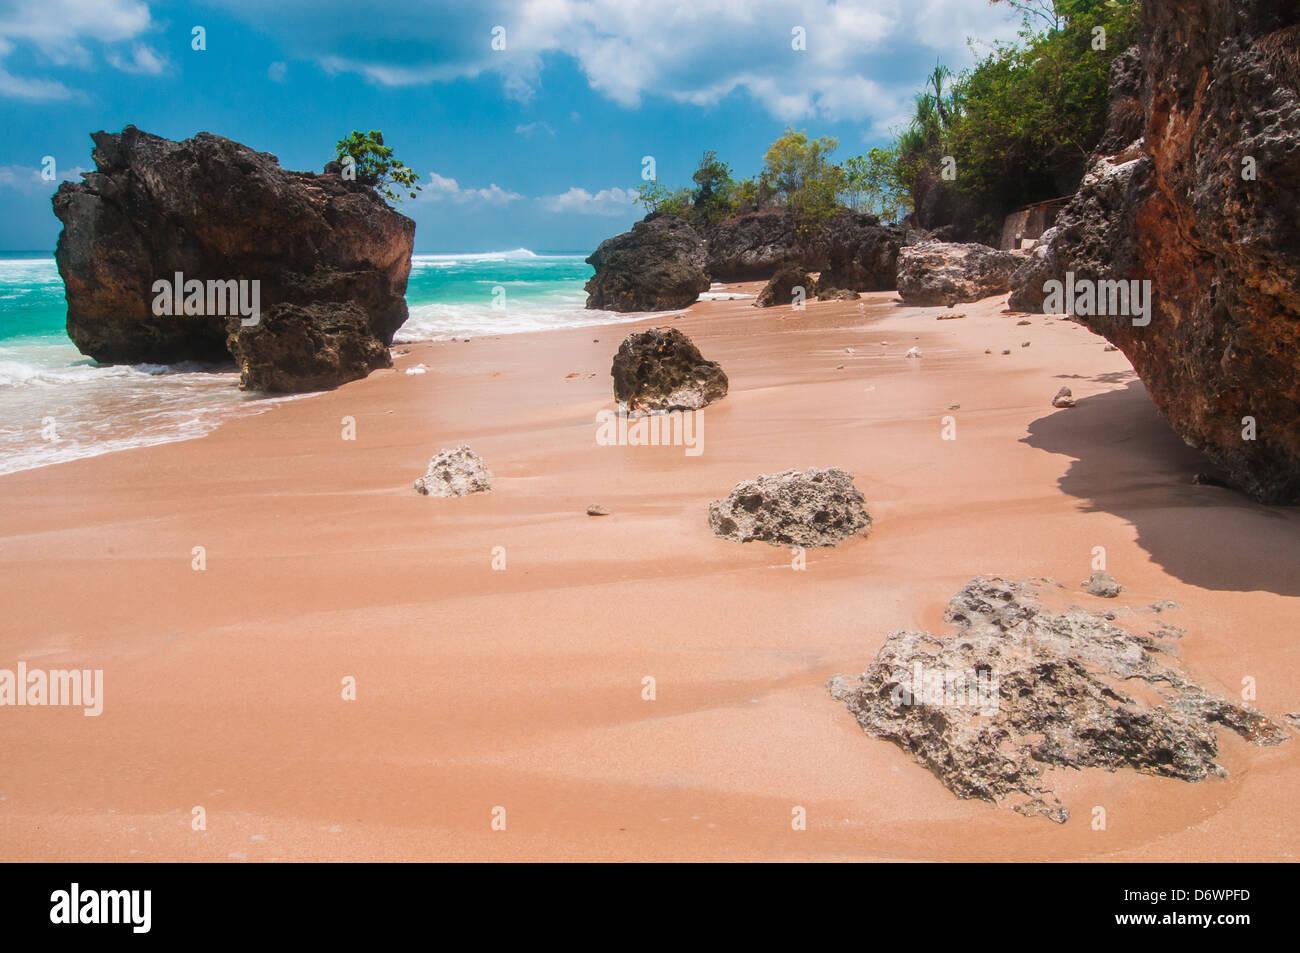 Tropical beach with volcanic rocks, Bali, Indonesia - Stock Image